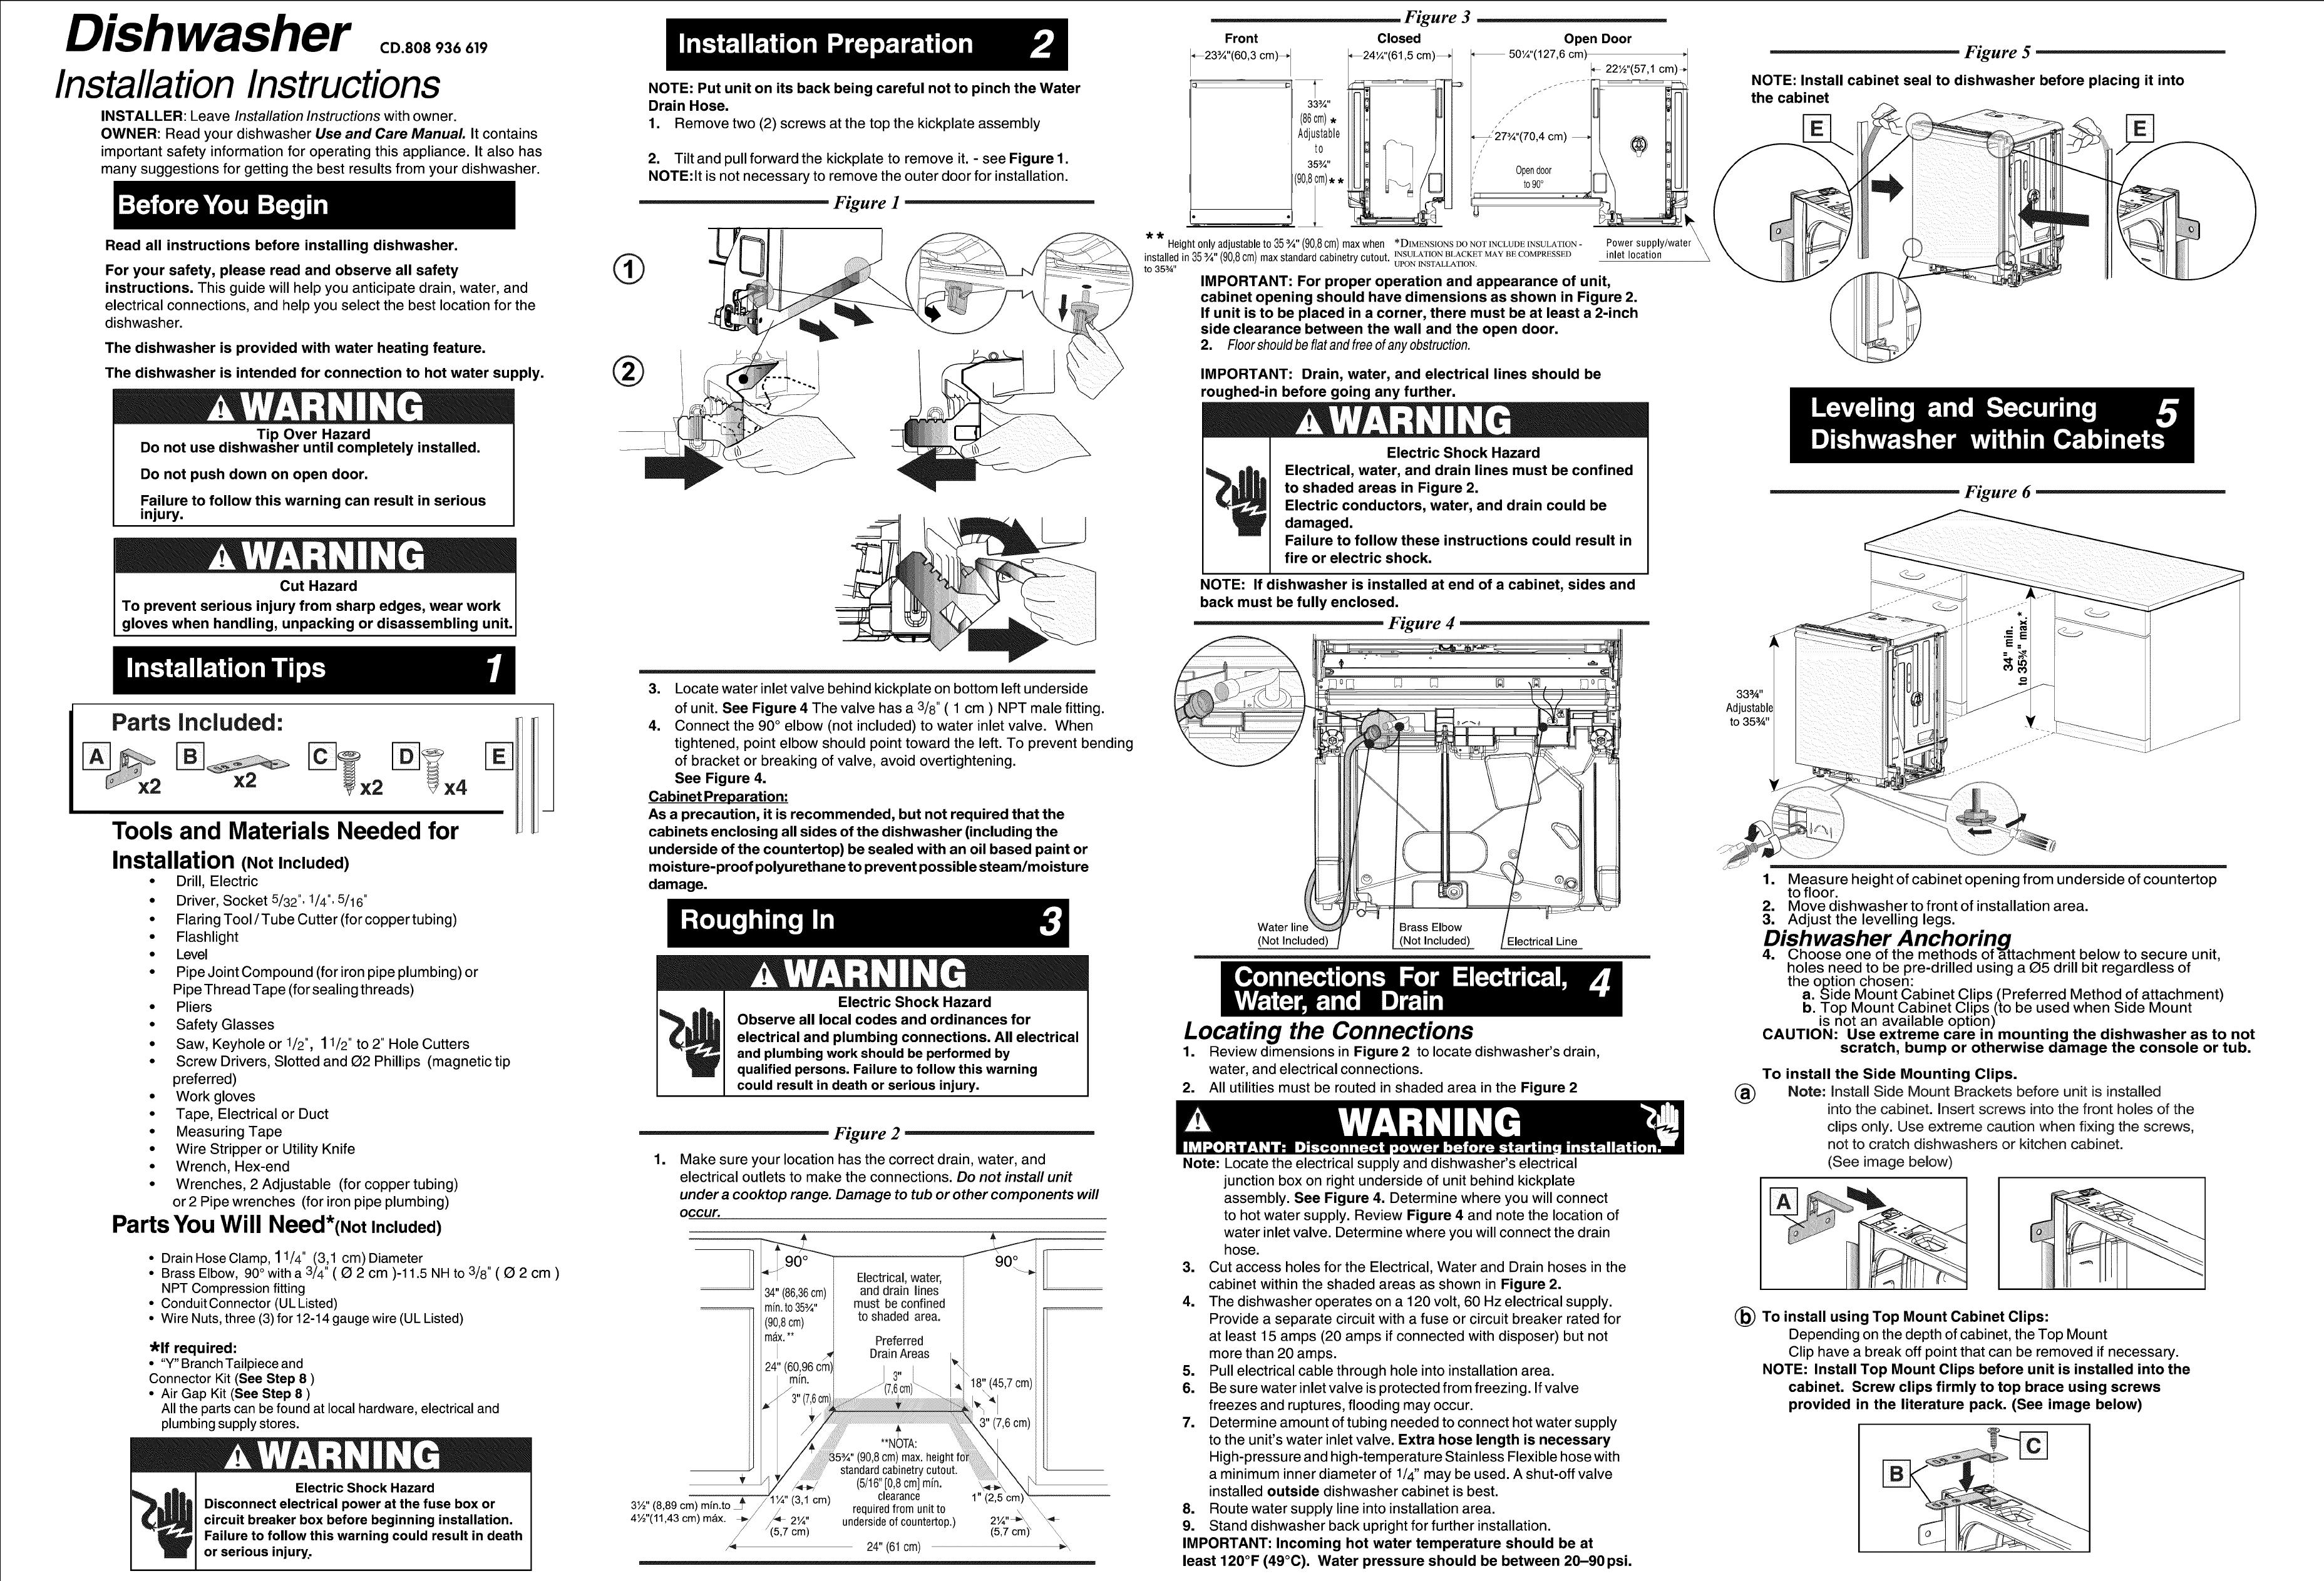 electrolux ei24id30qb0a user manual dishwasher manuals and guides rh usermanual wiki electrolux dishwasher service manual download electrolux icon dishwasher owners manual